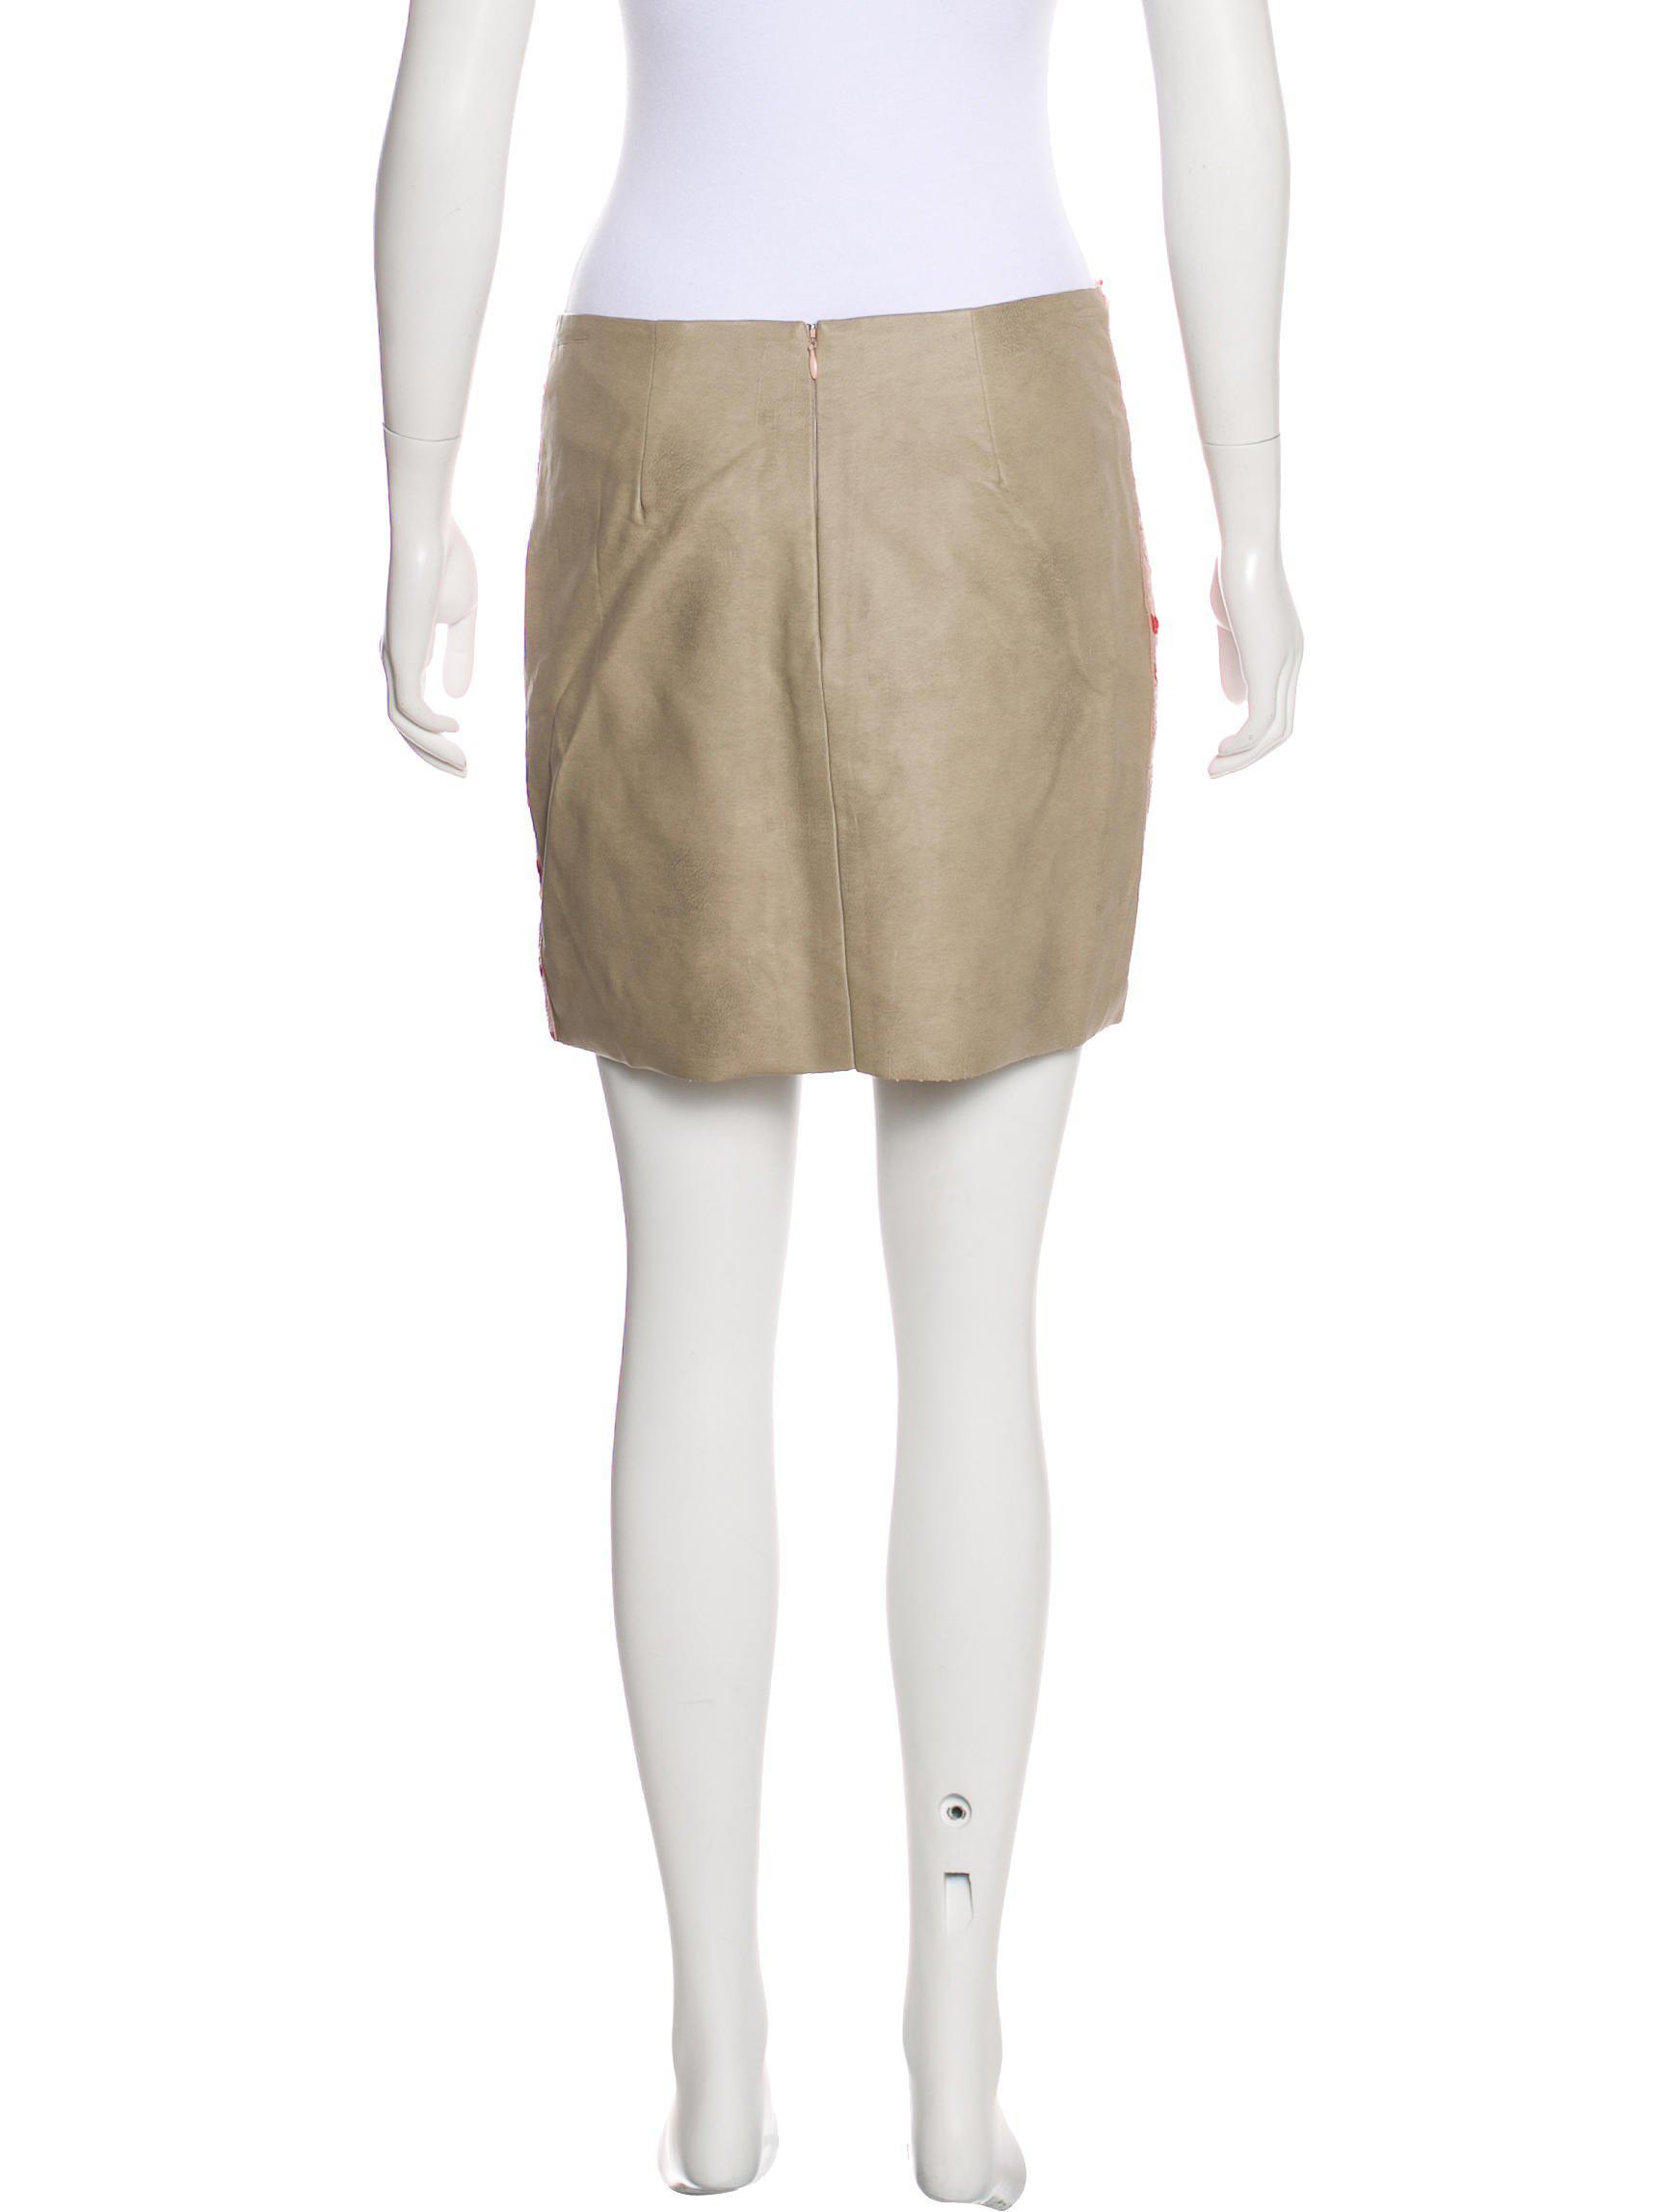 fcf6fbeb28 Sachin & Babi - Red Sequin Mini Skirt - Lyst. View fullscreen